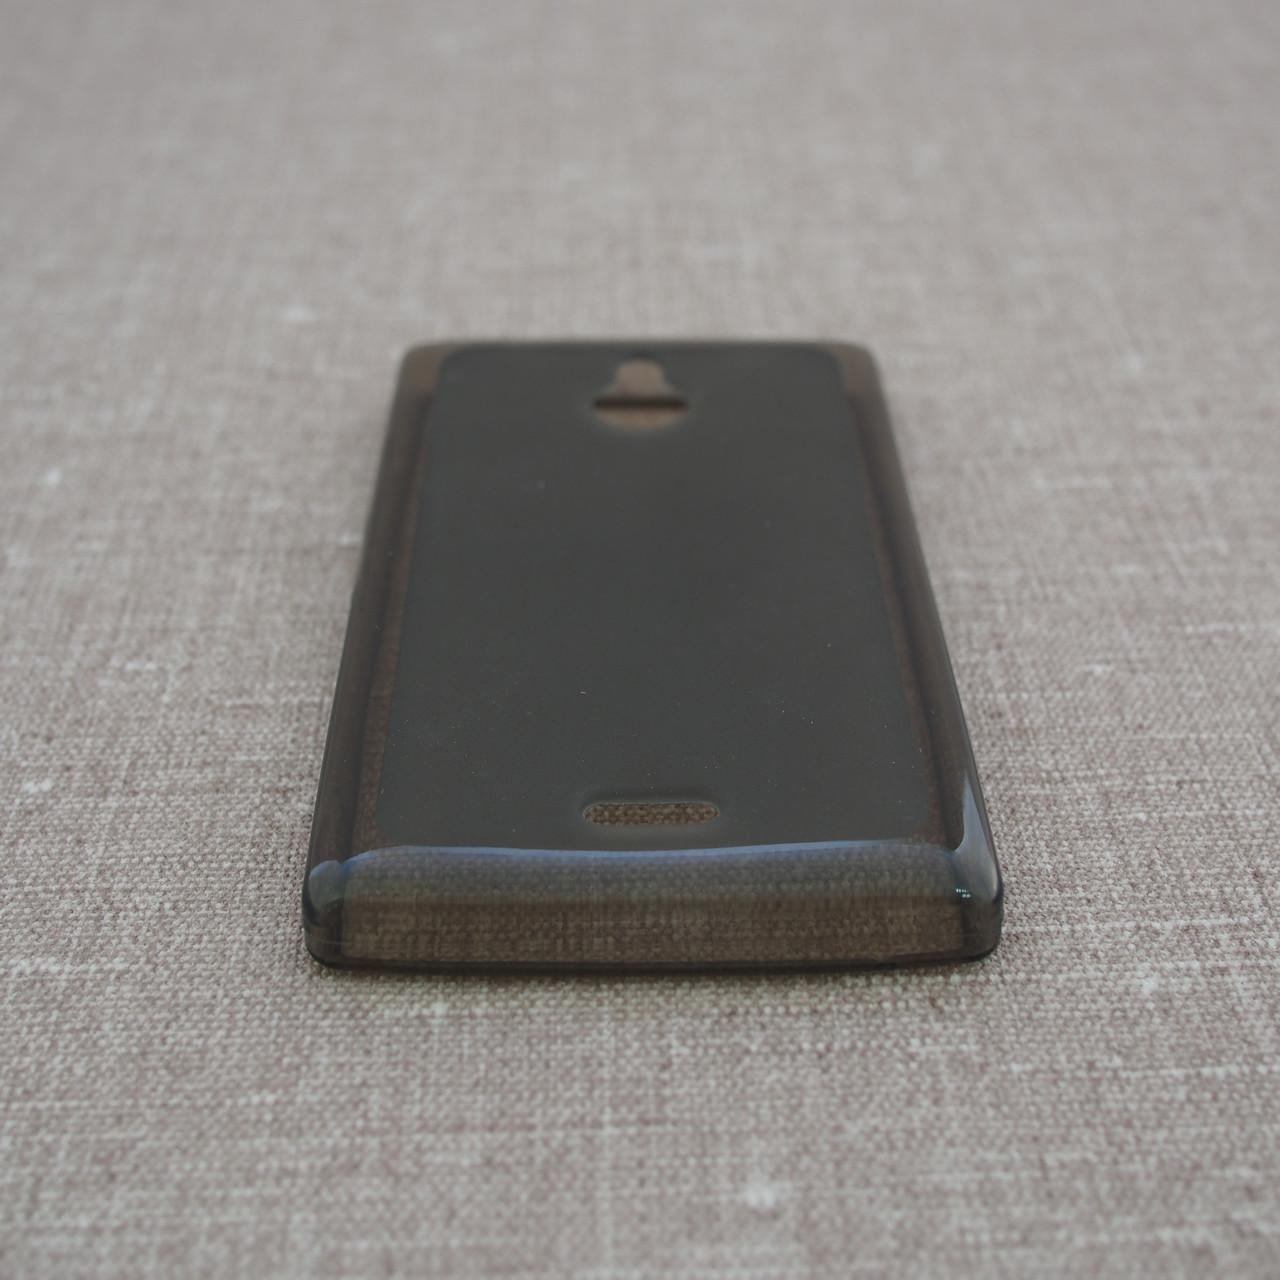 Epik TPU Nokia X2 grey